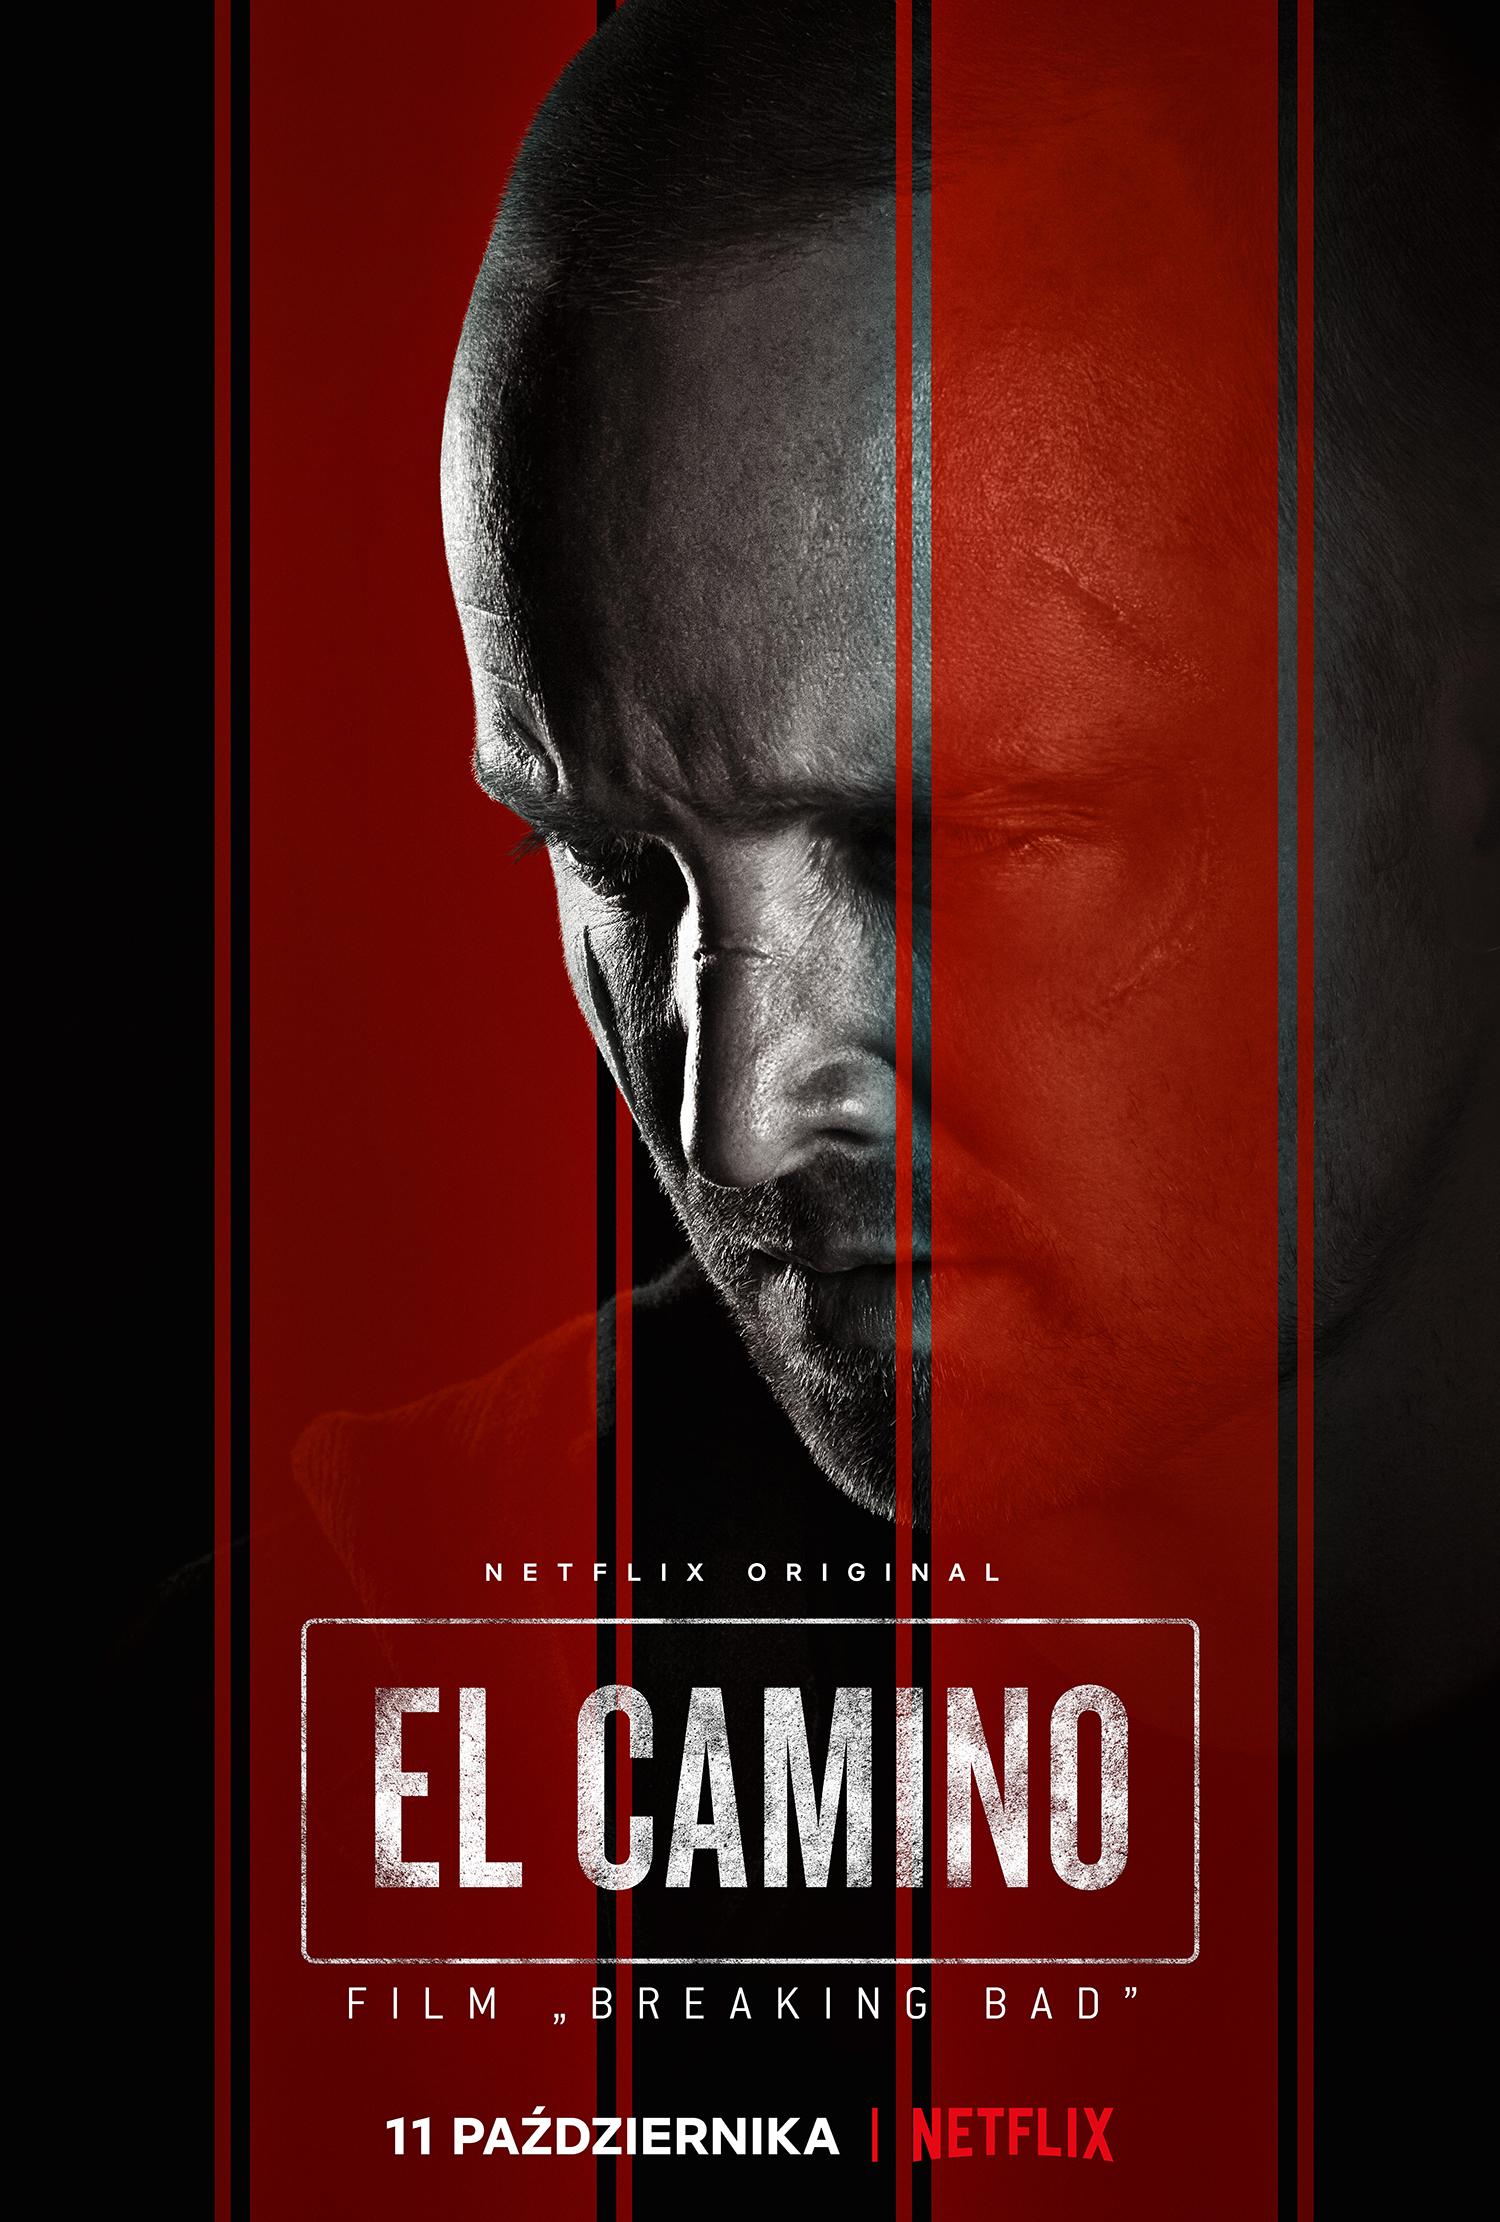 El Camino: Film Breaking Bad teaser